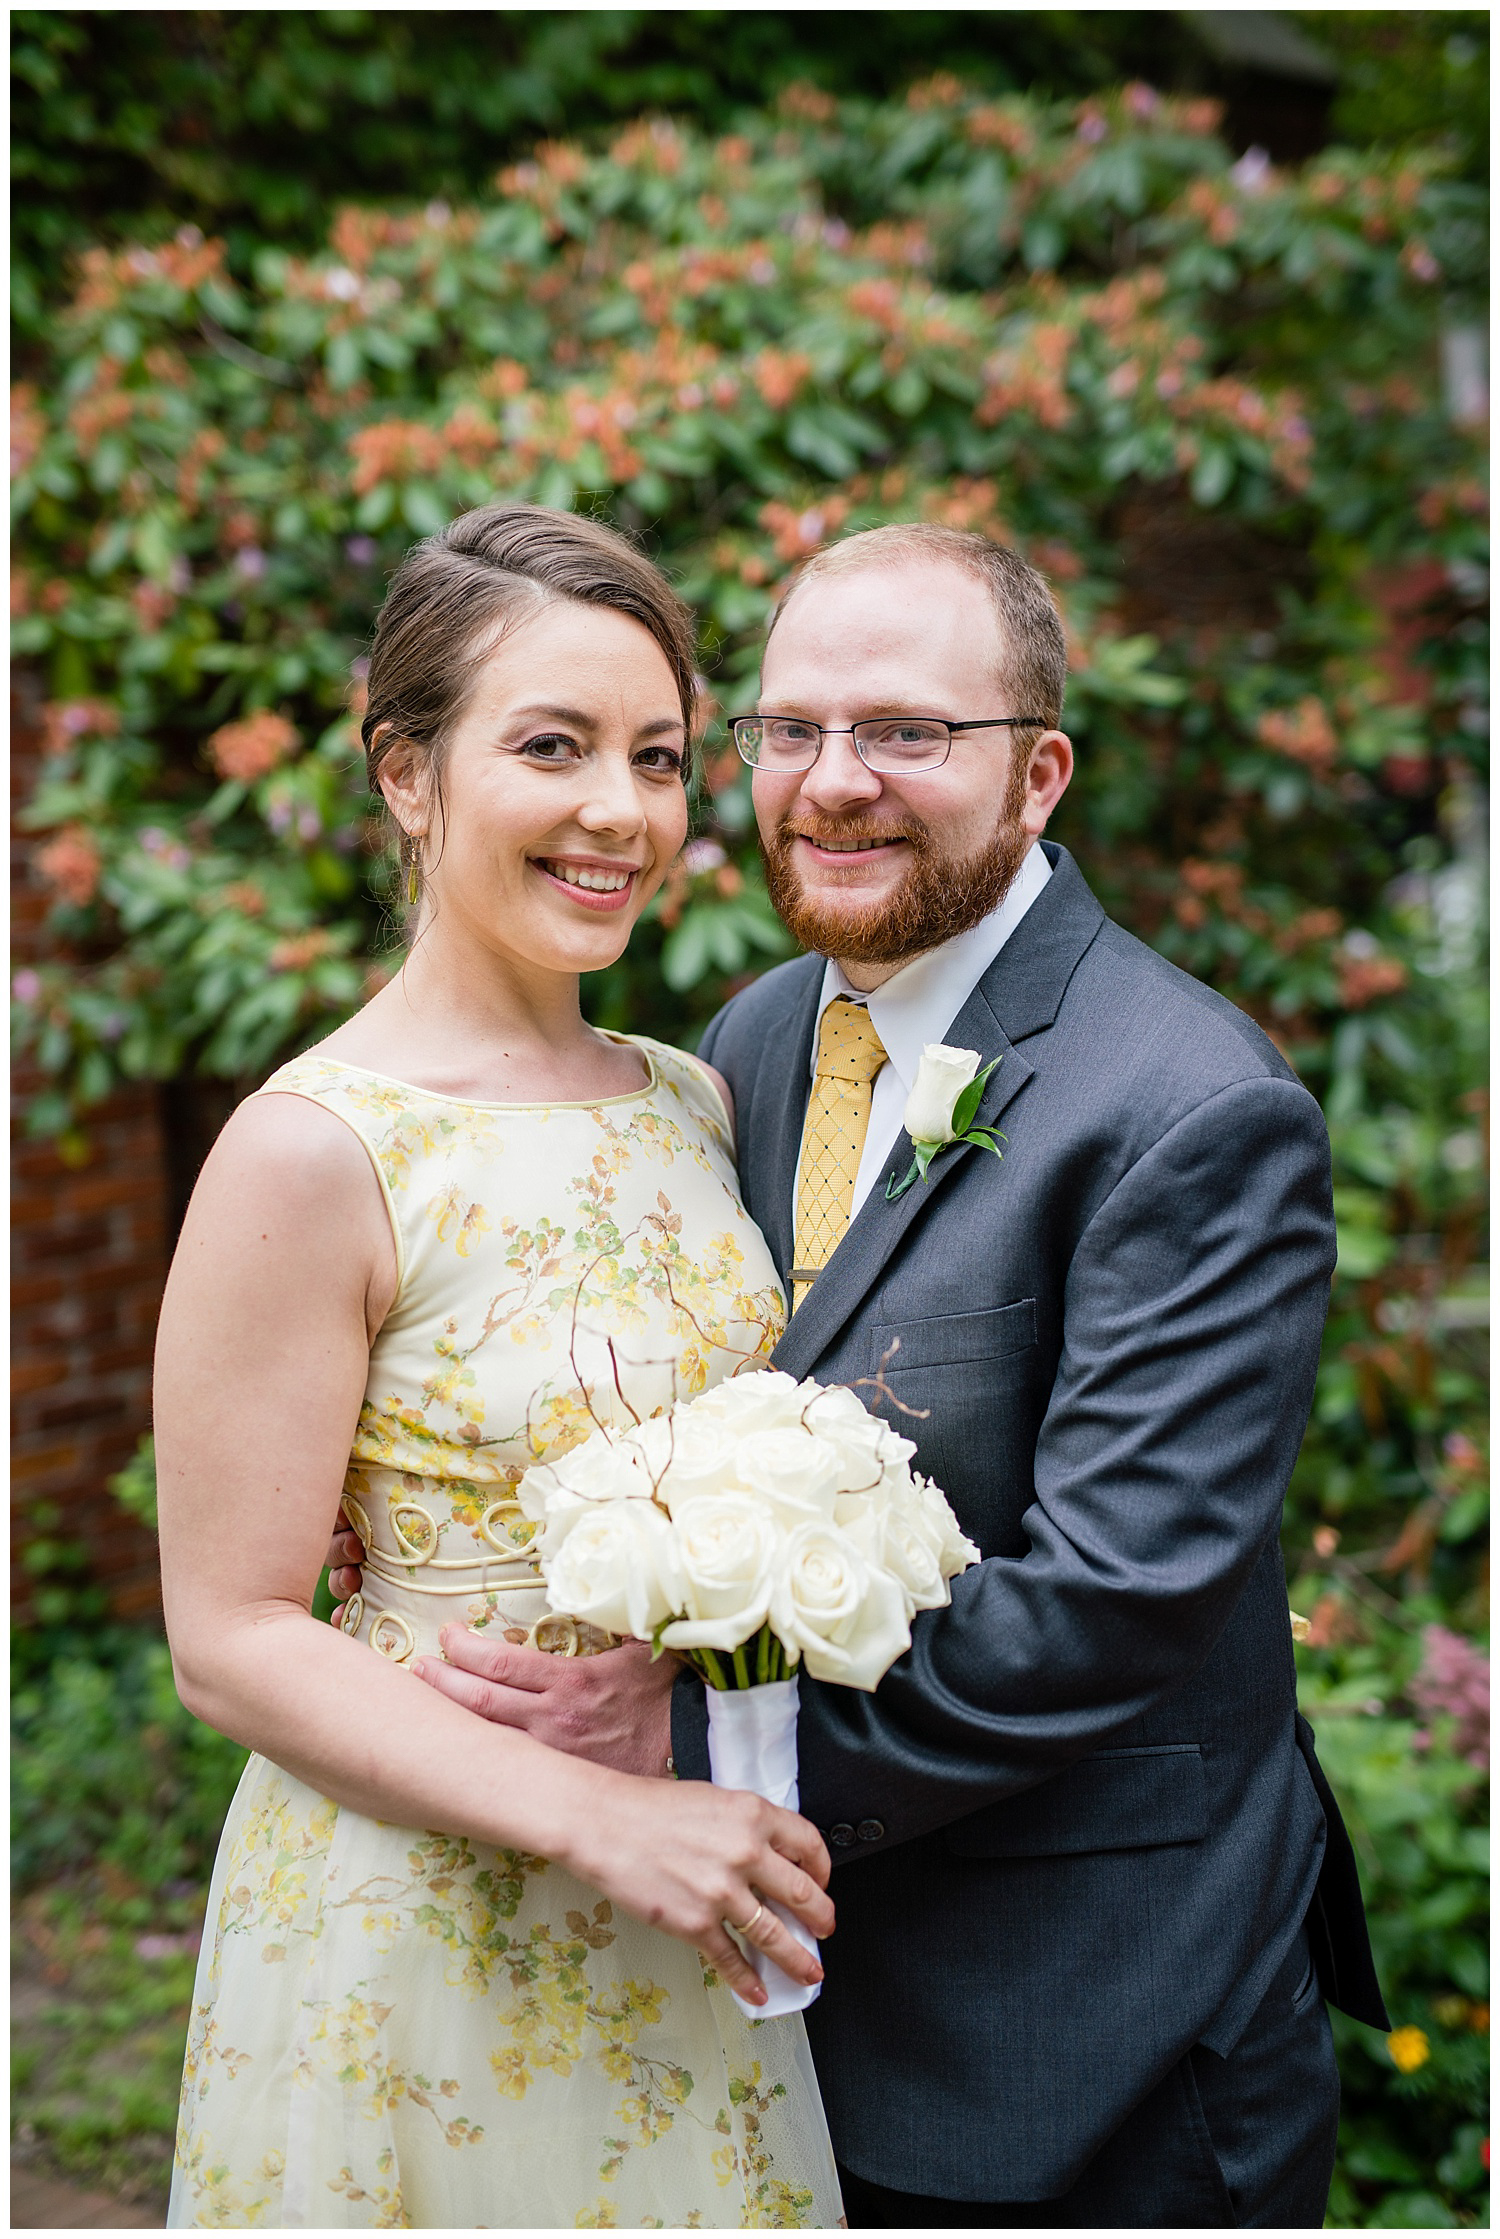 Lynn-Musuem-Wedding-Boston-Photographer-26-North-Studios-016.jpg